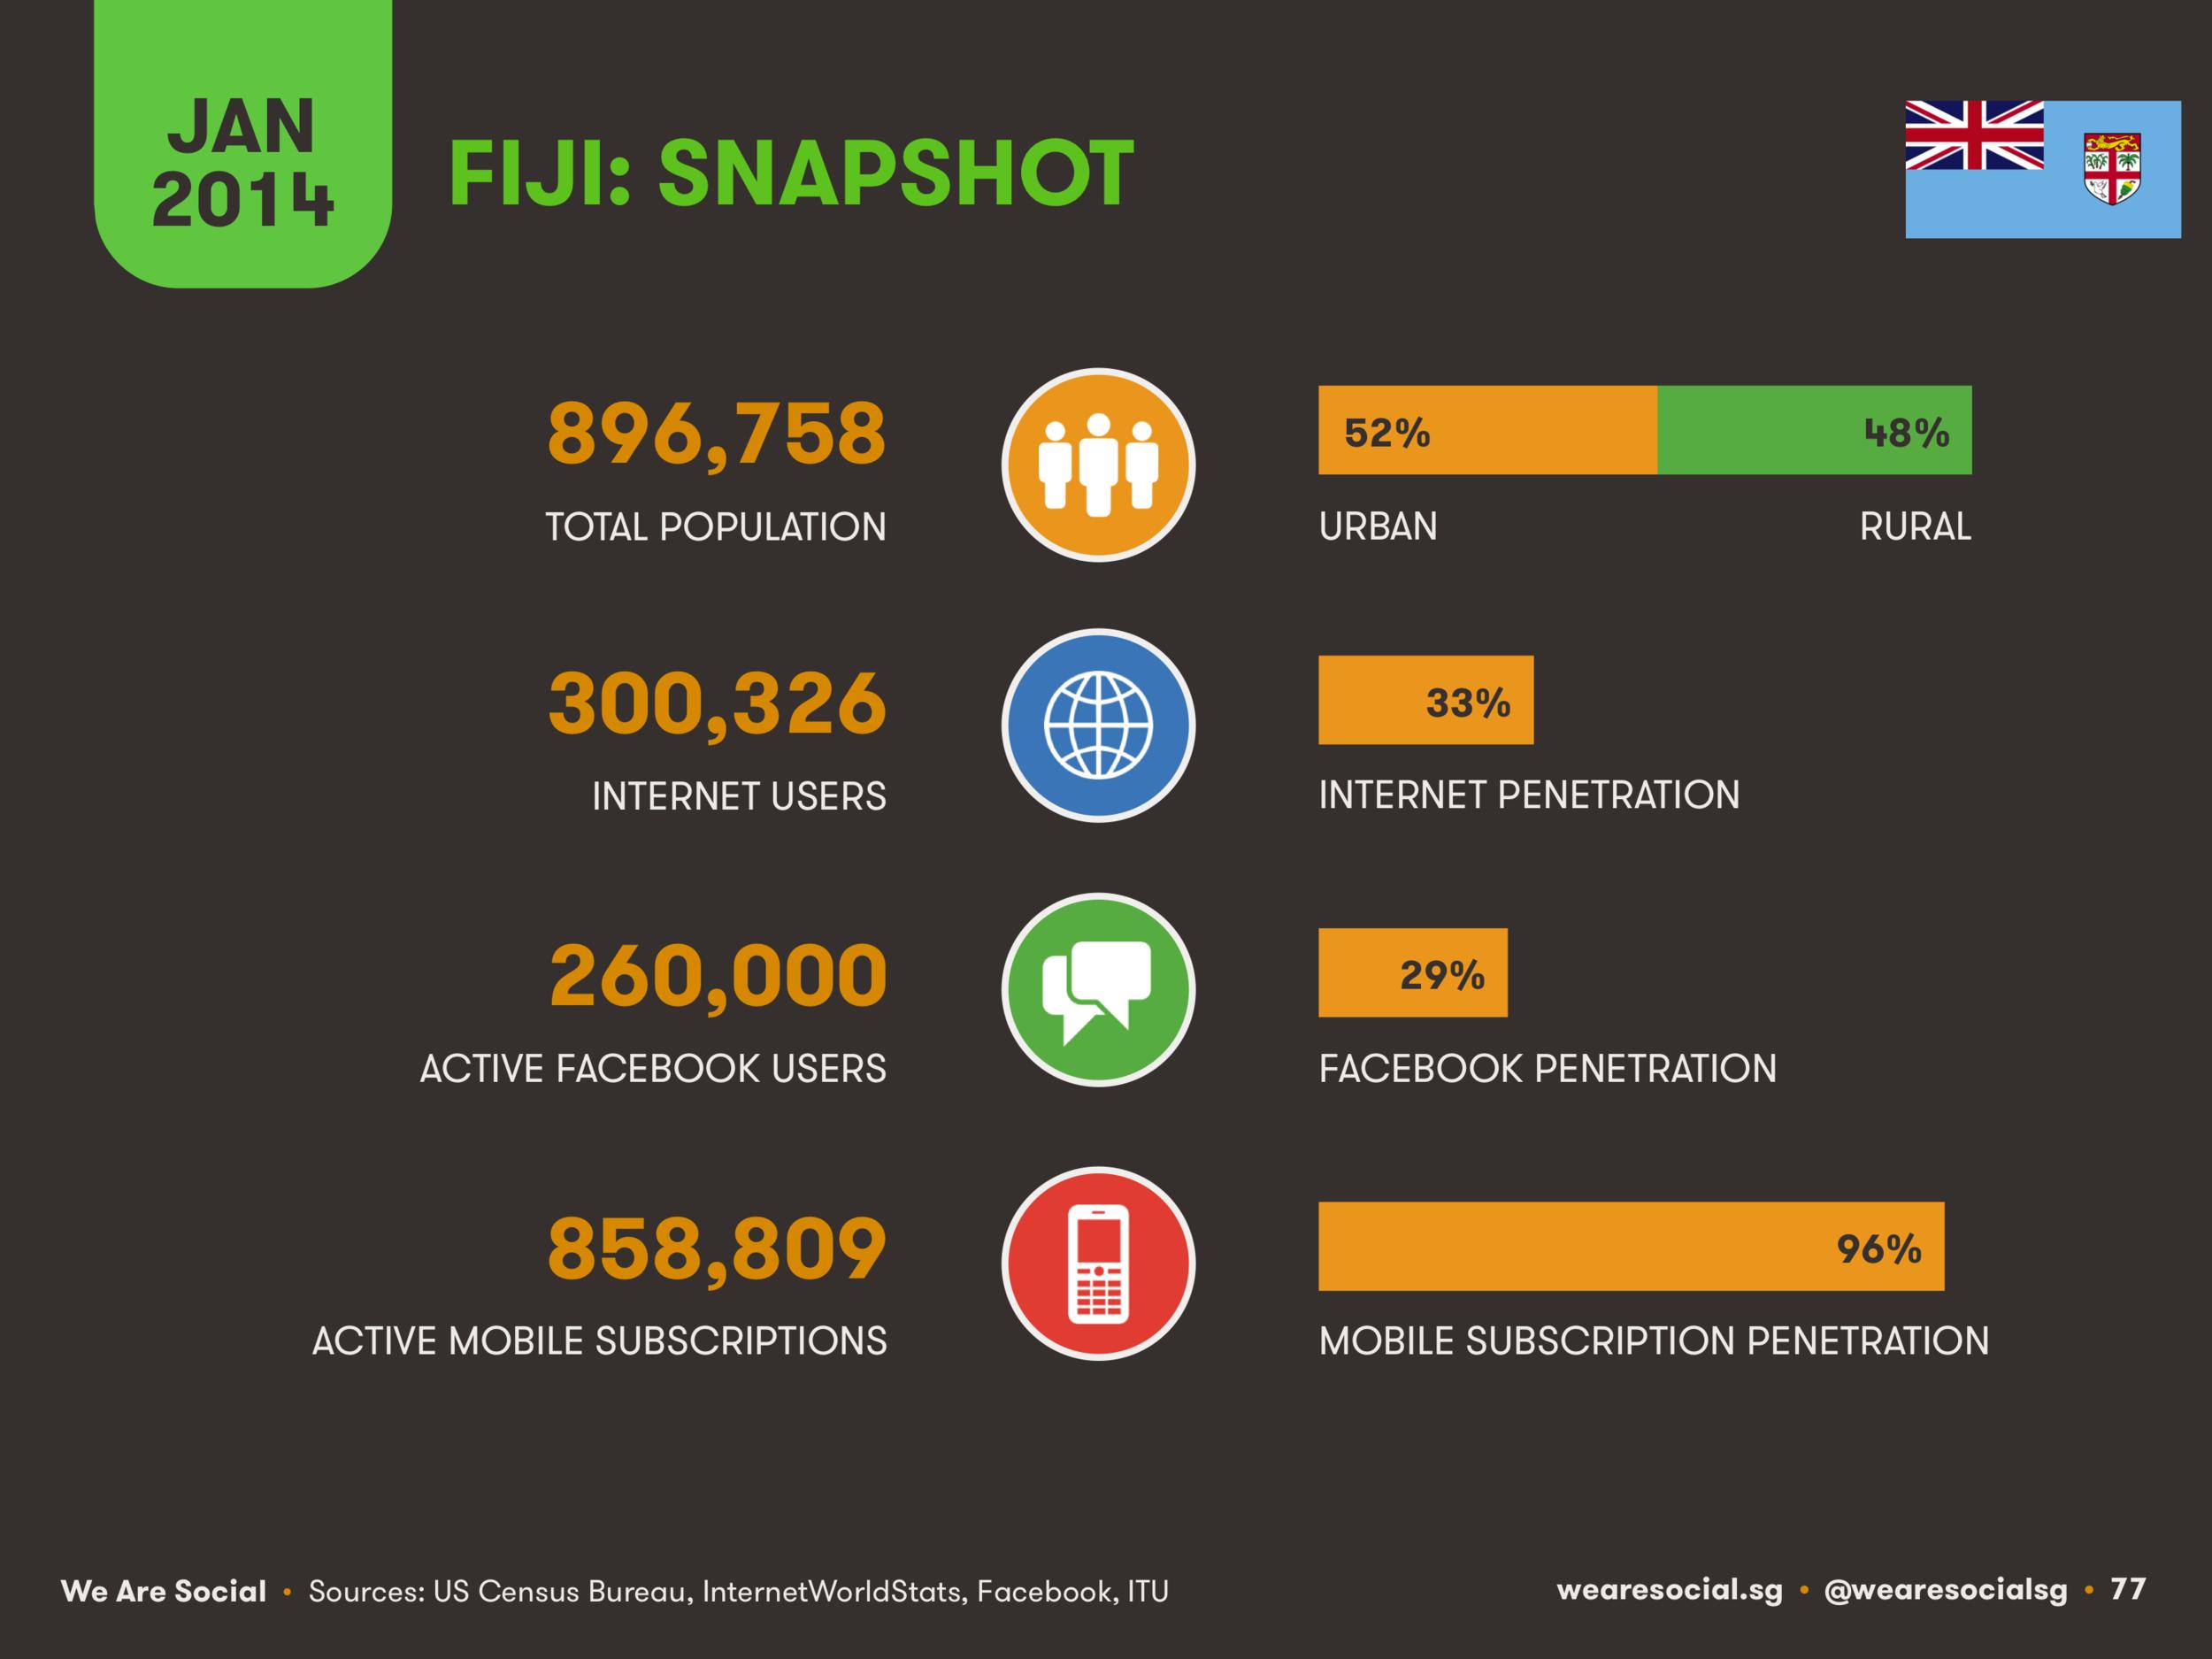 Digital in Fiji January 2014 DataReportal